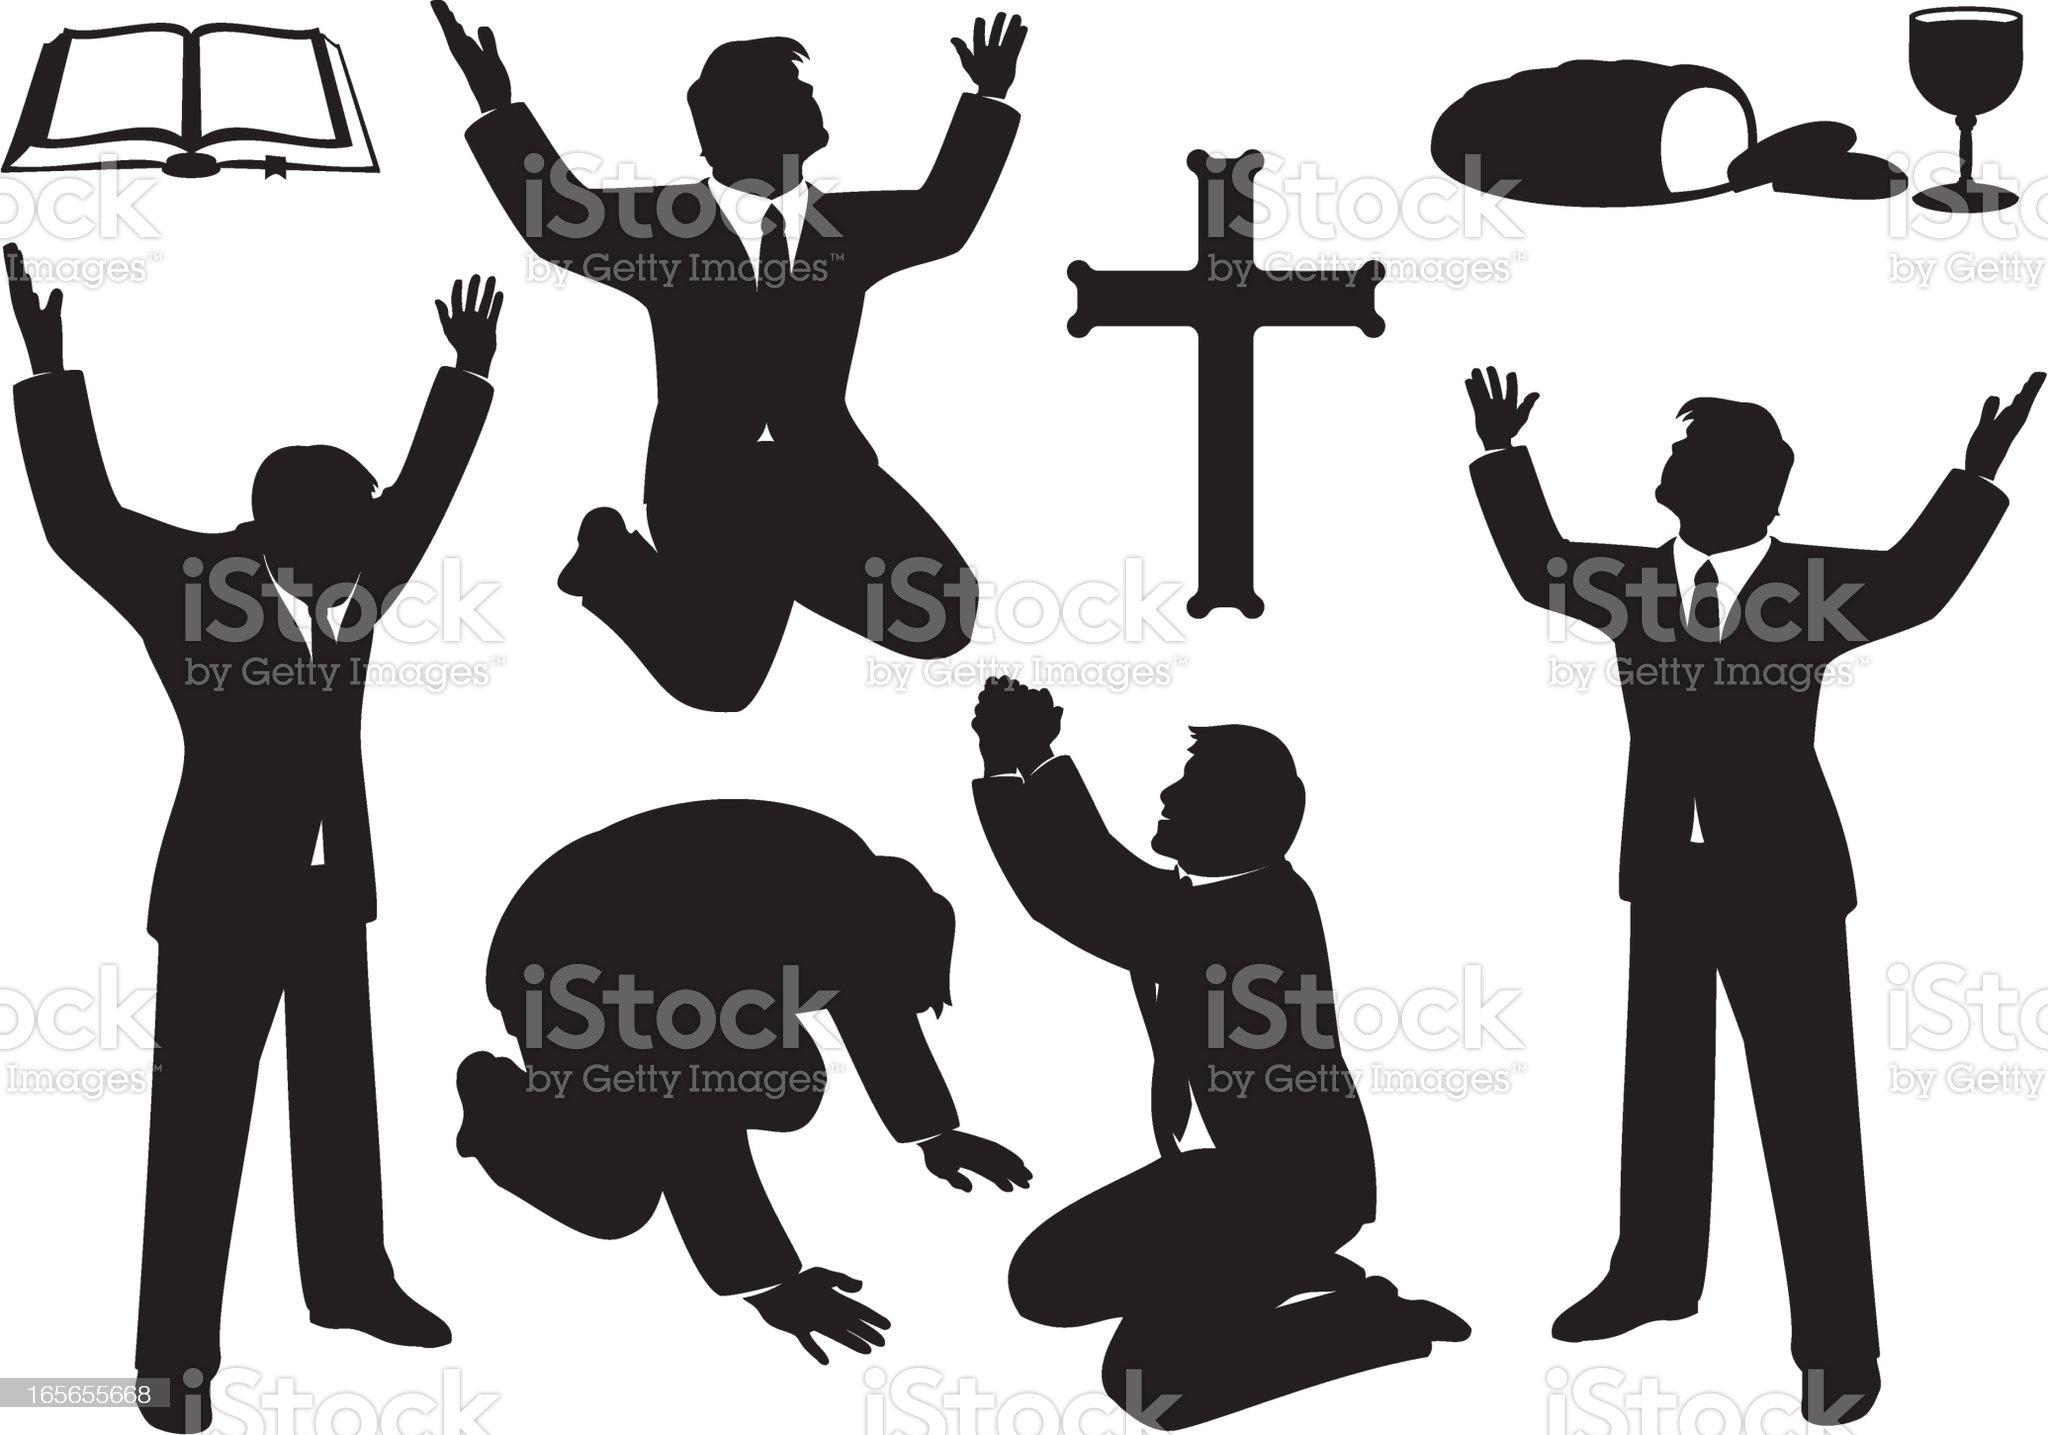 Christian Prayer and Praise Silhouette Set royalty-free stock vector art